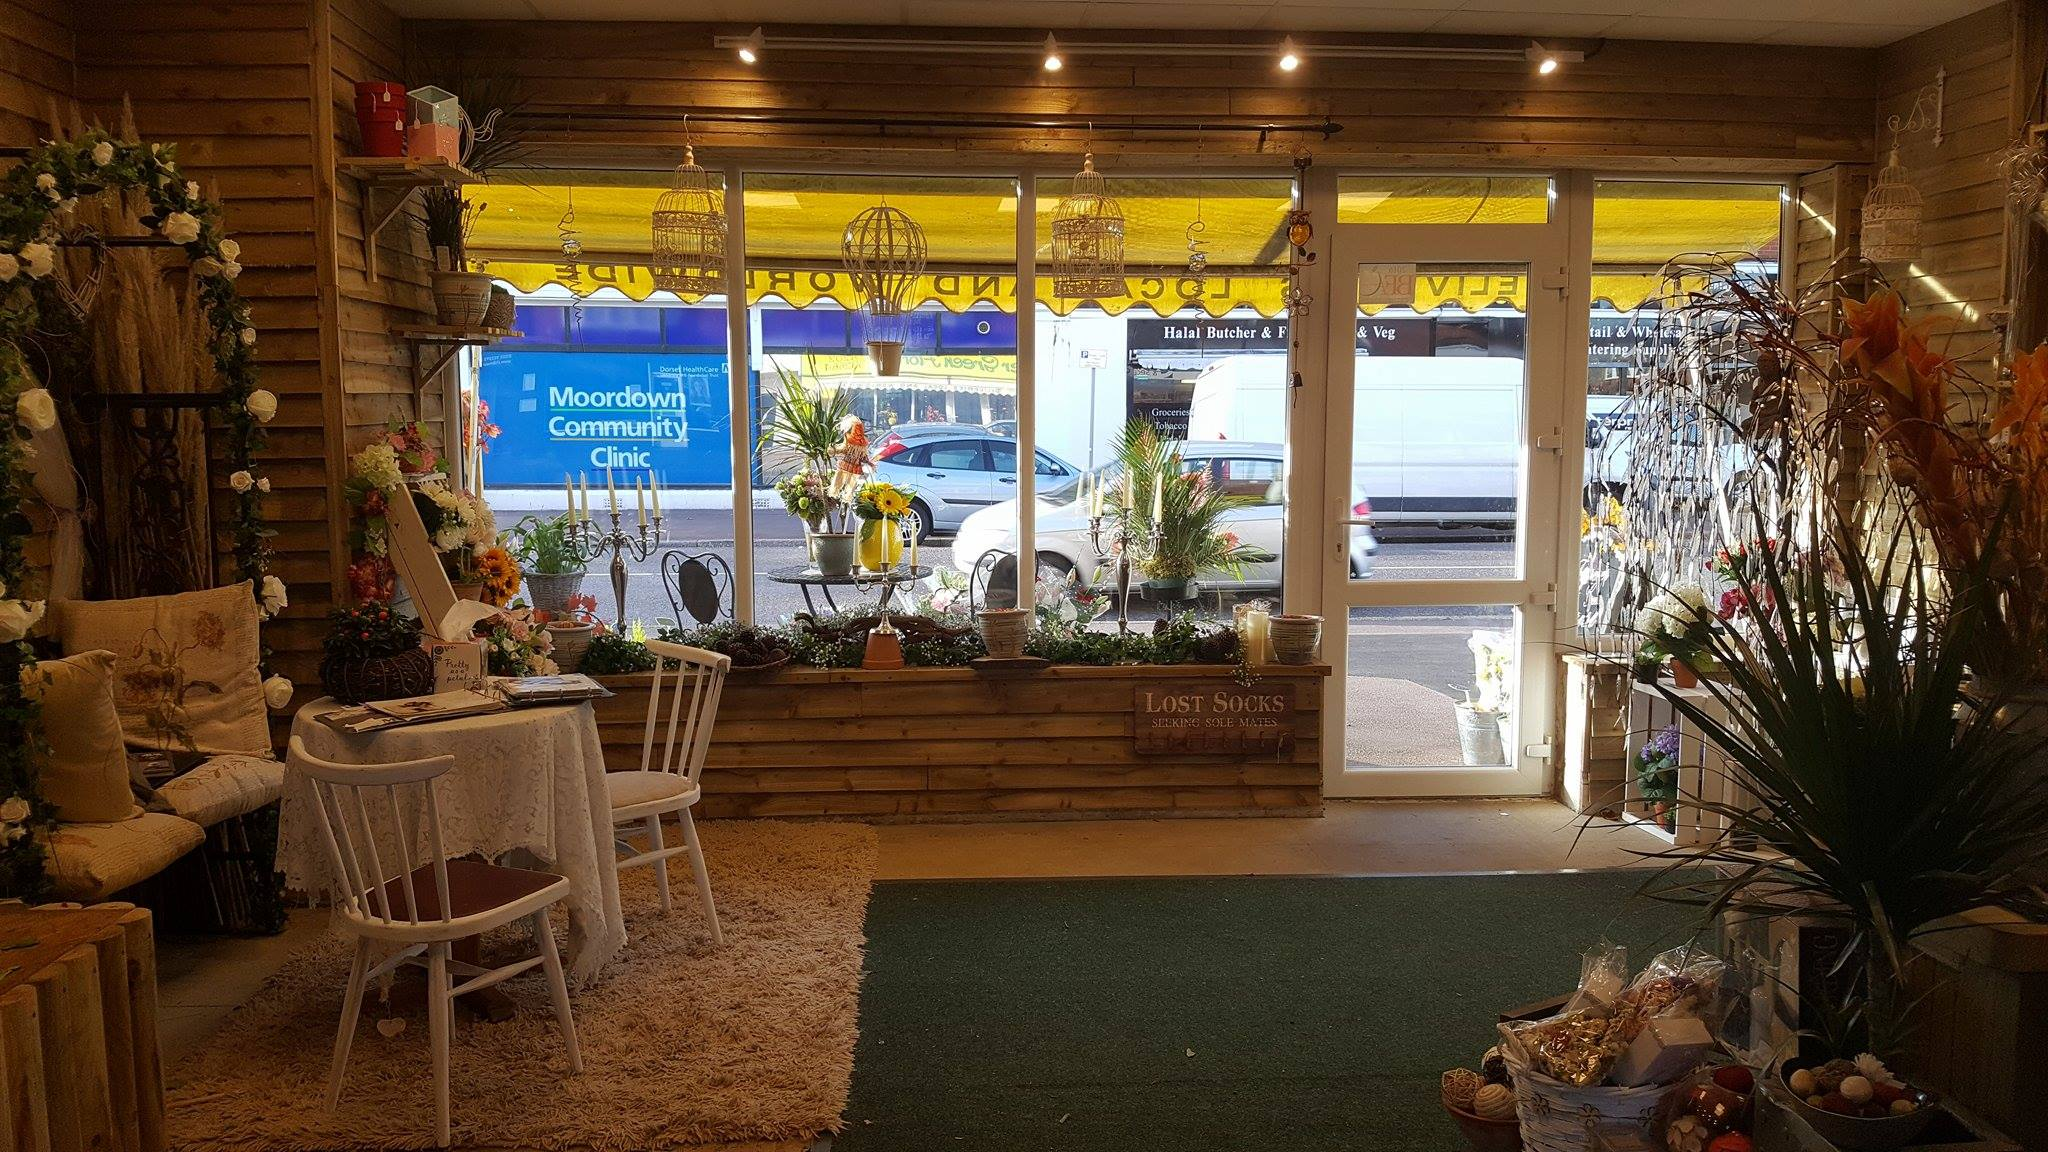 inside the flower shop